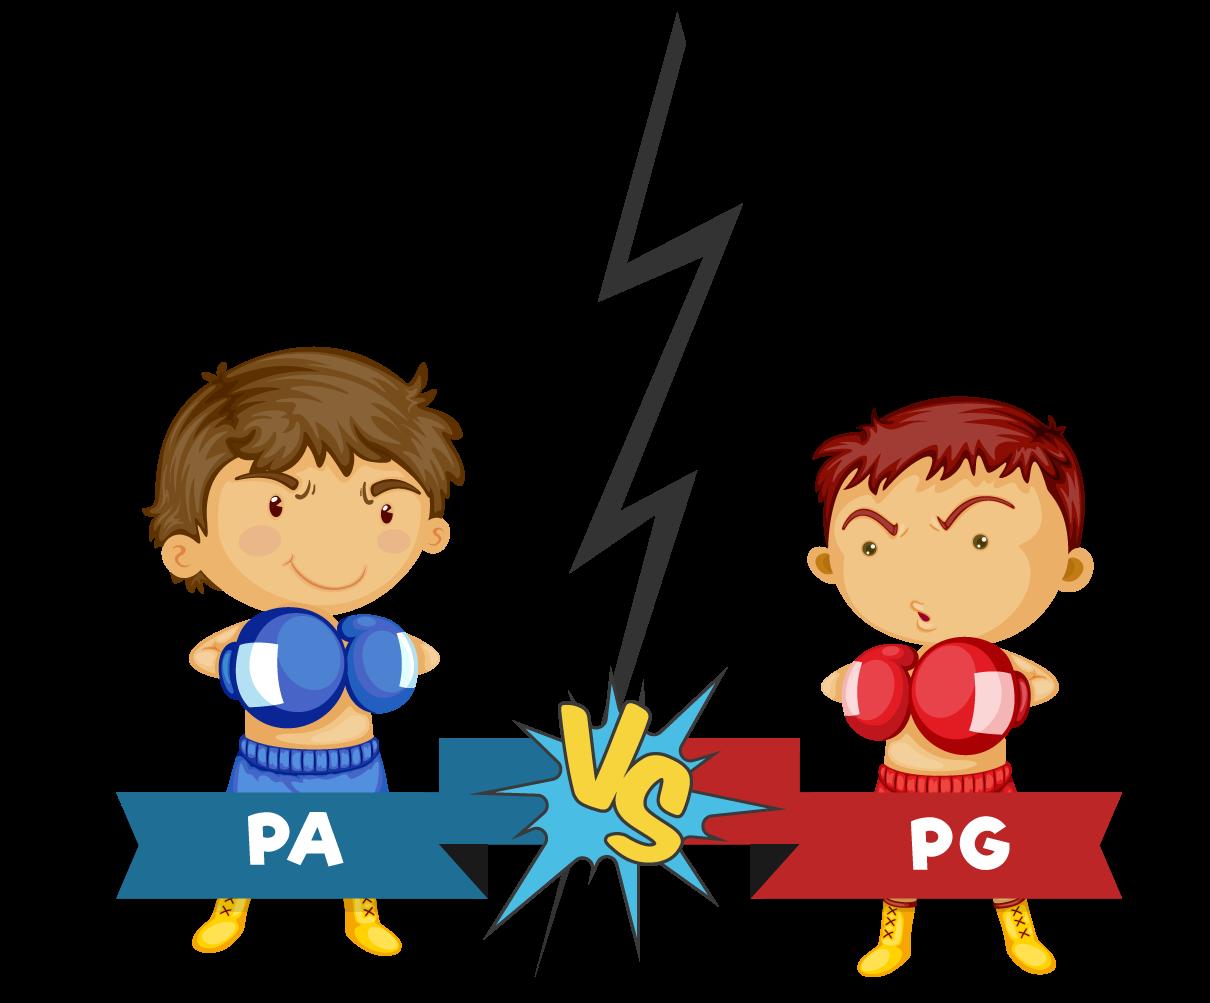 PA está lutando contra a PG